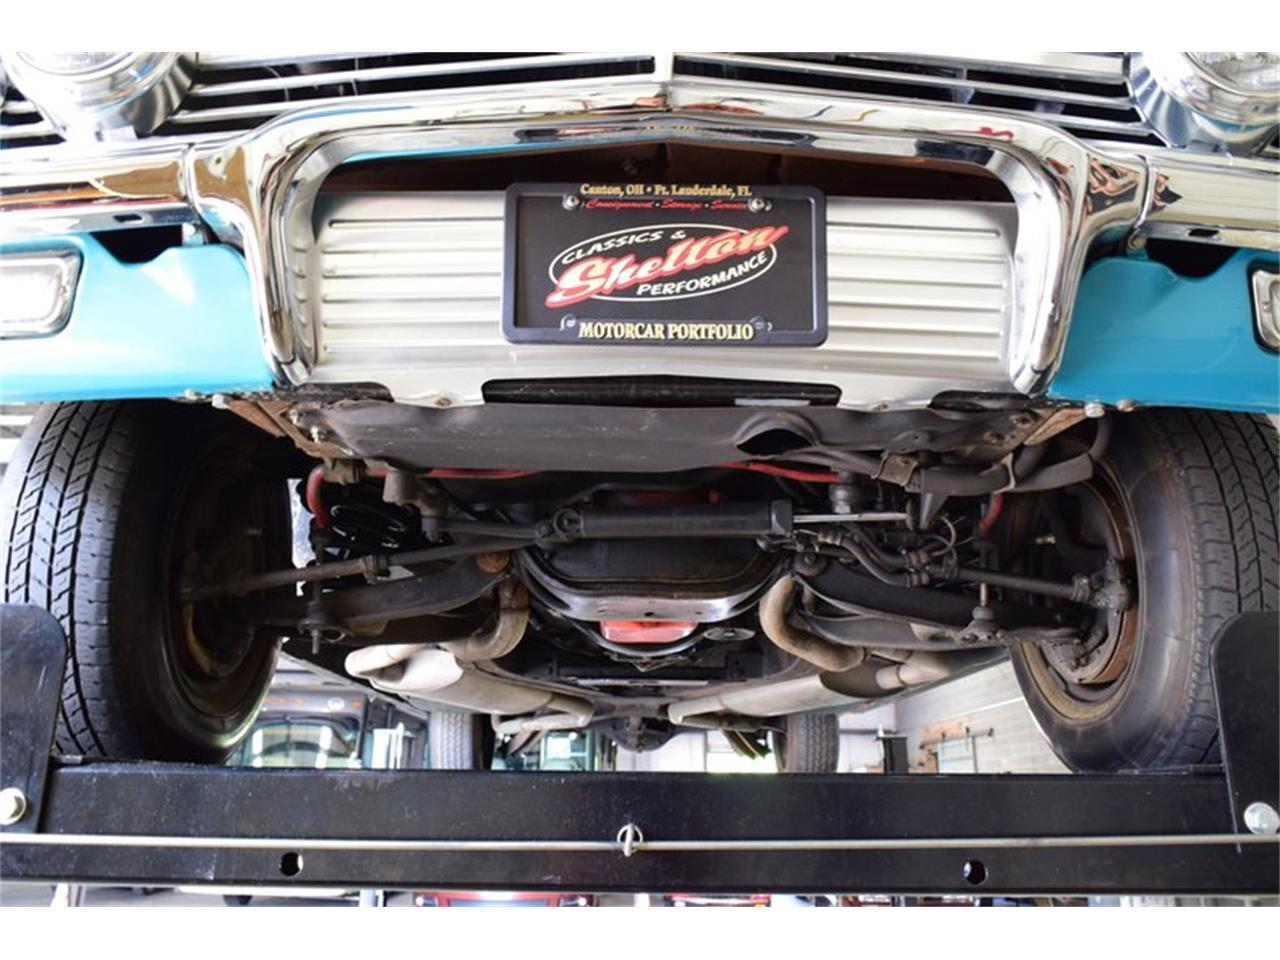 Large Picture of Classic 1960 Chevrolet El Camino located in Mooresville North Carolina - $48,995.00 - Q525